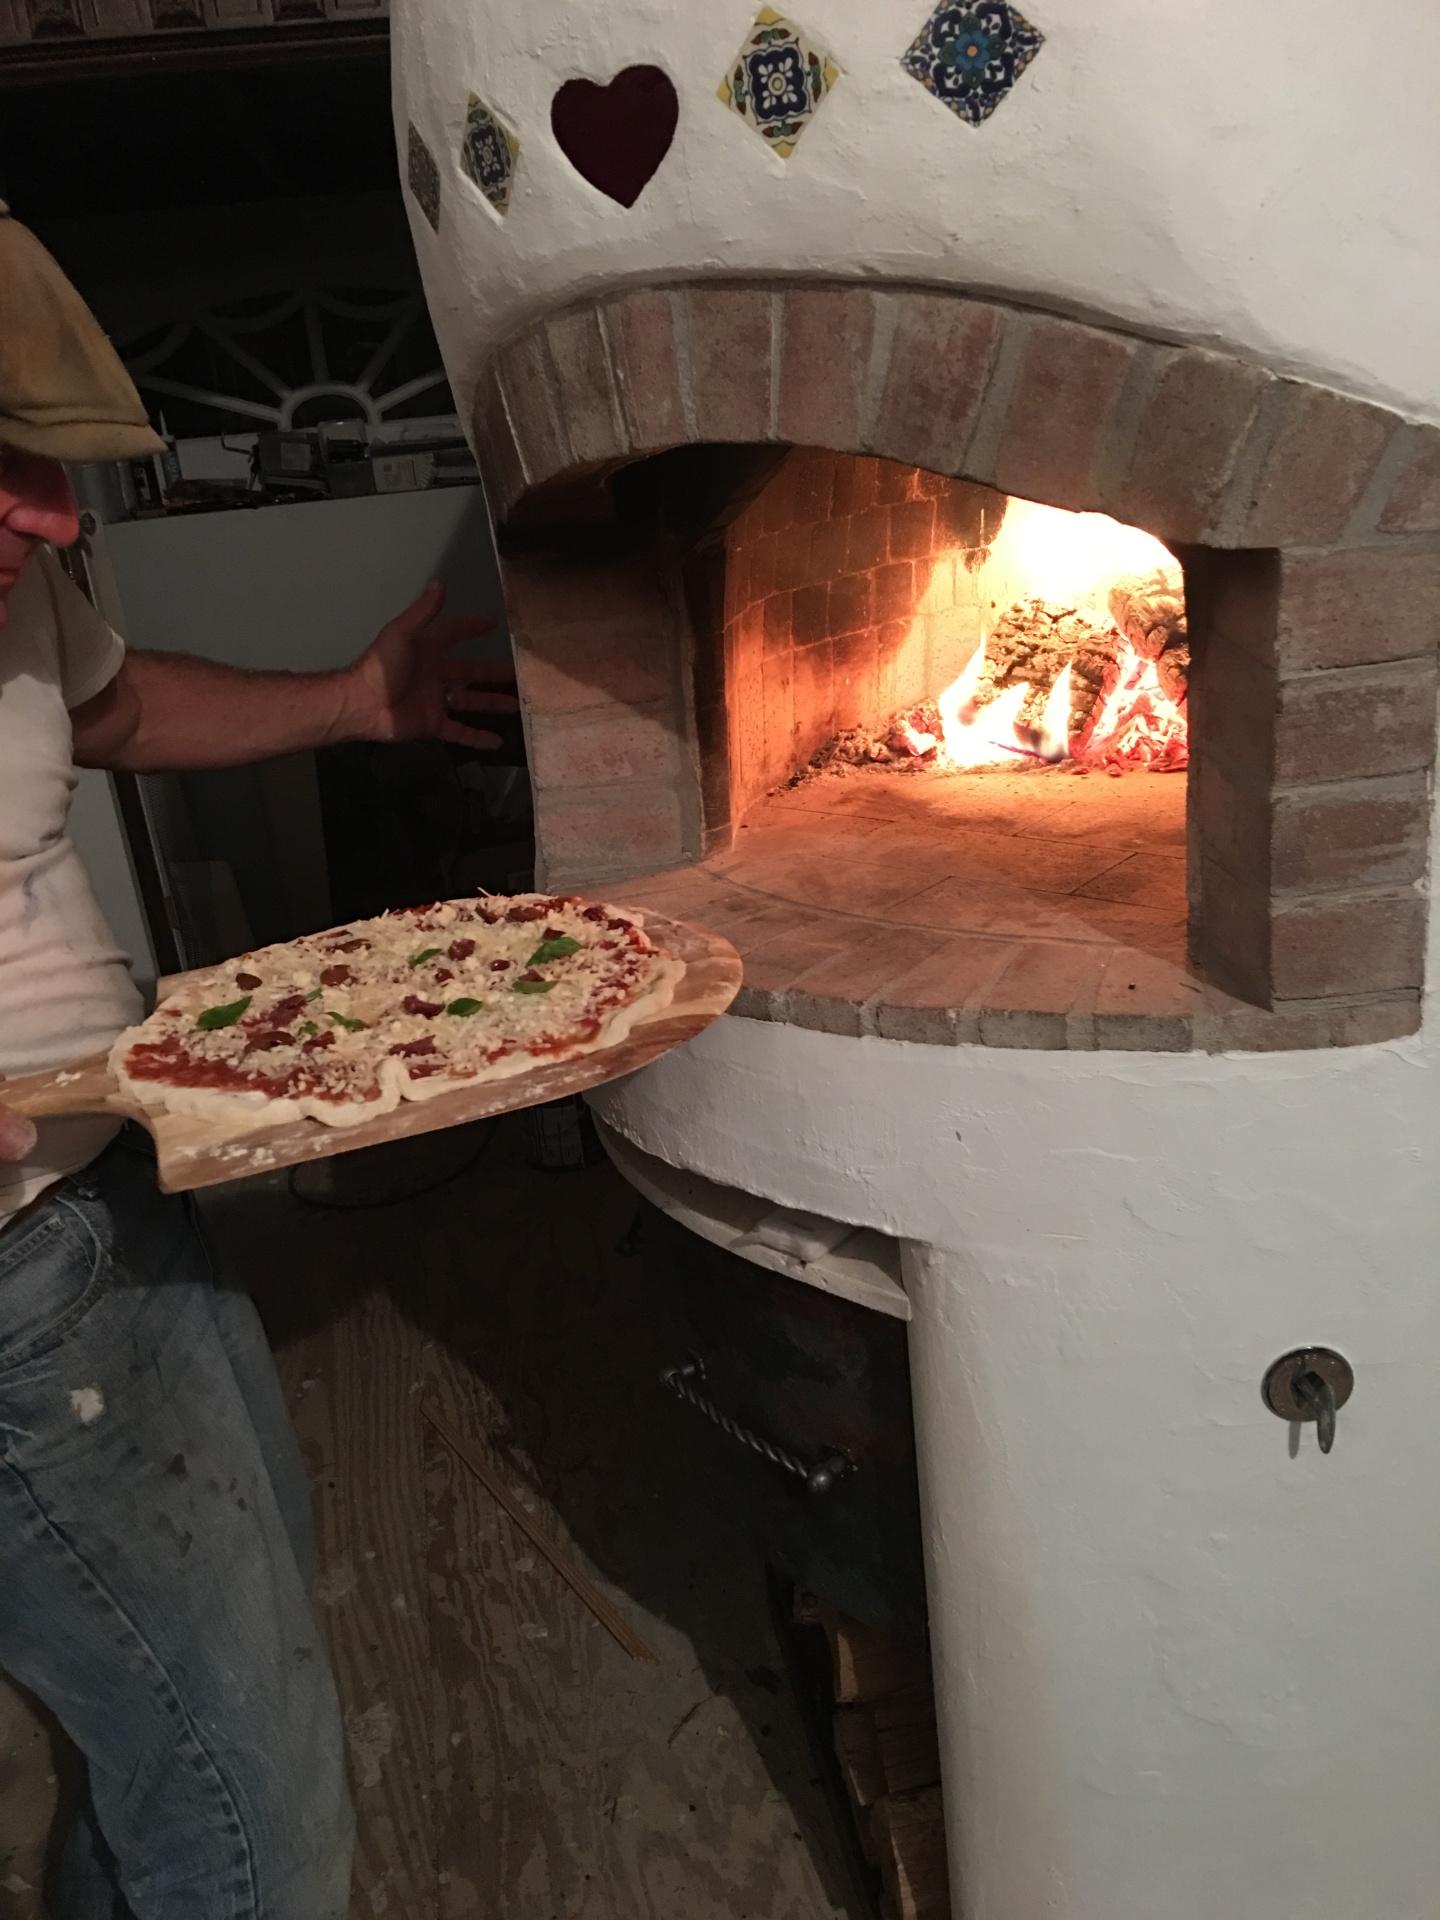 Perfecting 🍕 pizza 🔥